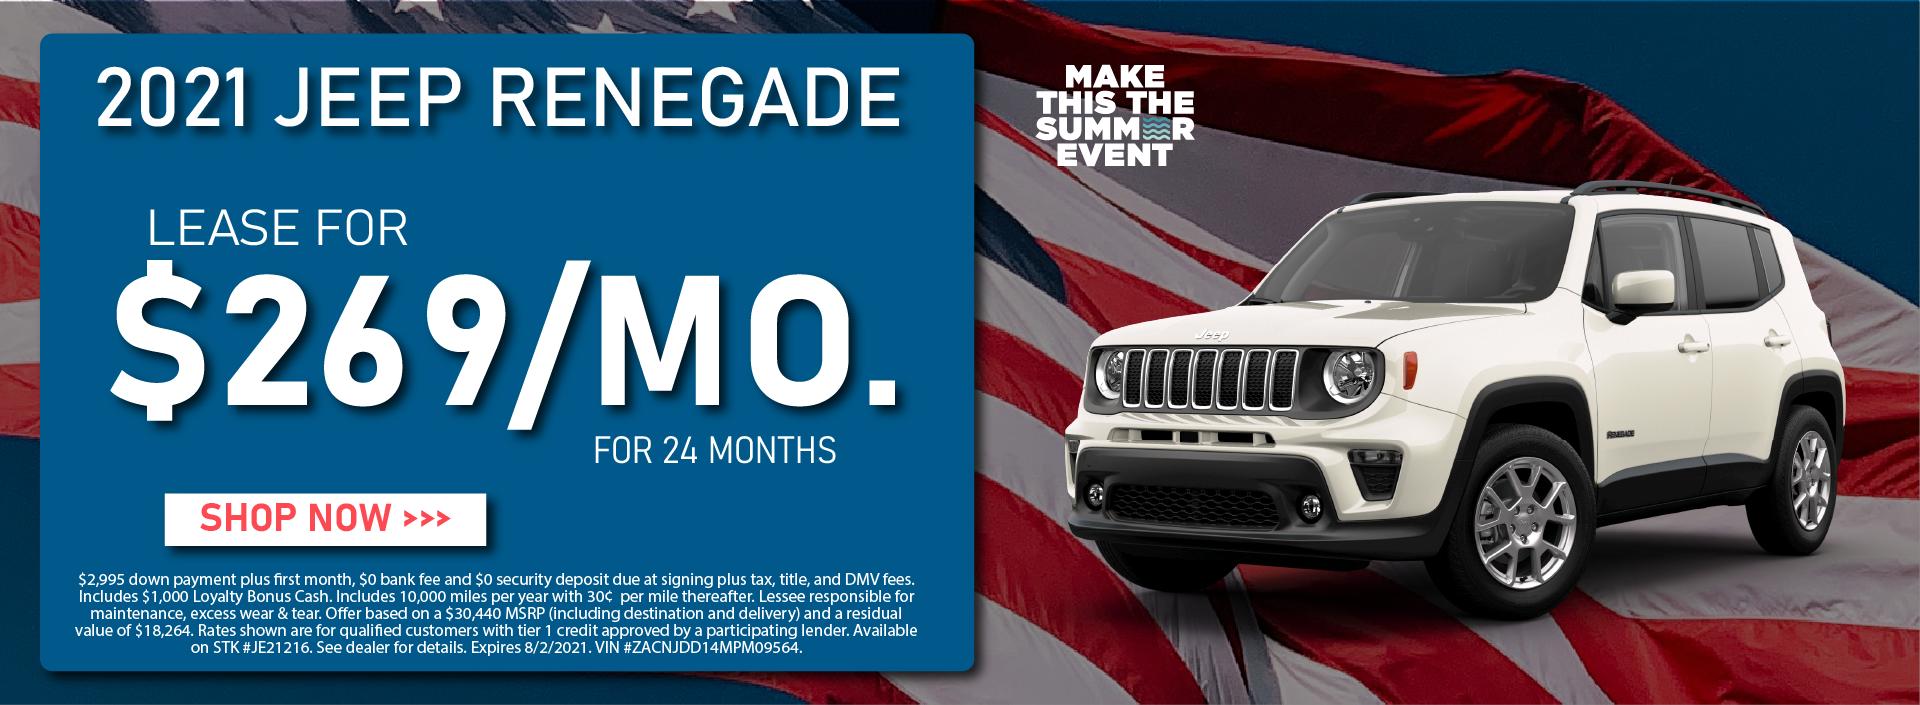 CDJR Manhattan – July 2021 – Jeep Renegade